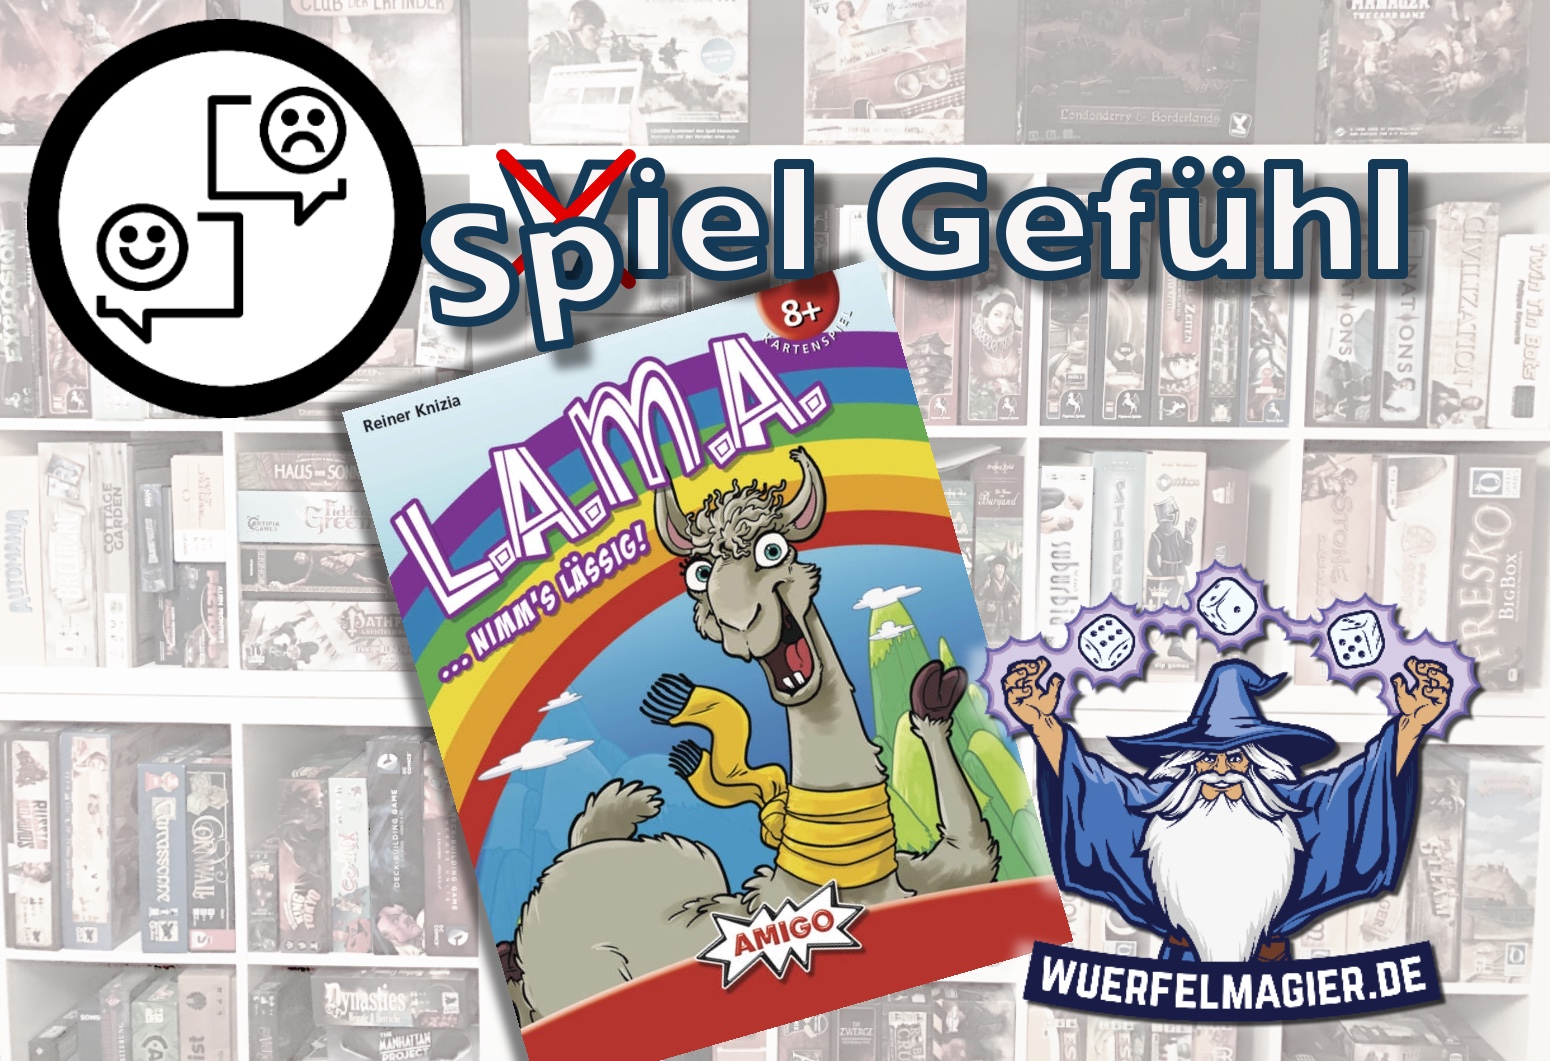 L.A.M.A. Lama Amigo Spiele Wuerfelmagier Würfelmagier Spiel Gefühl Rezension